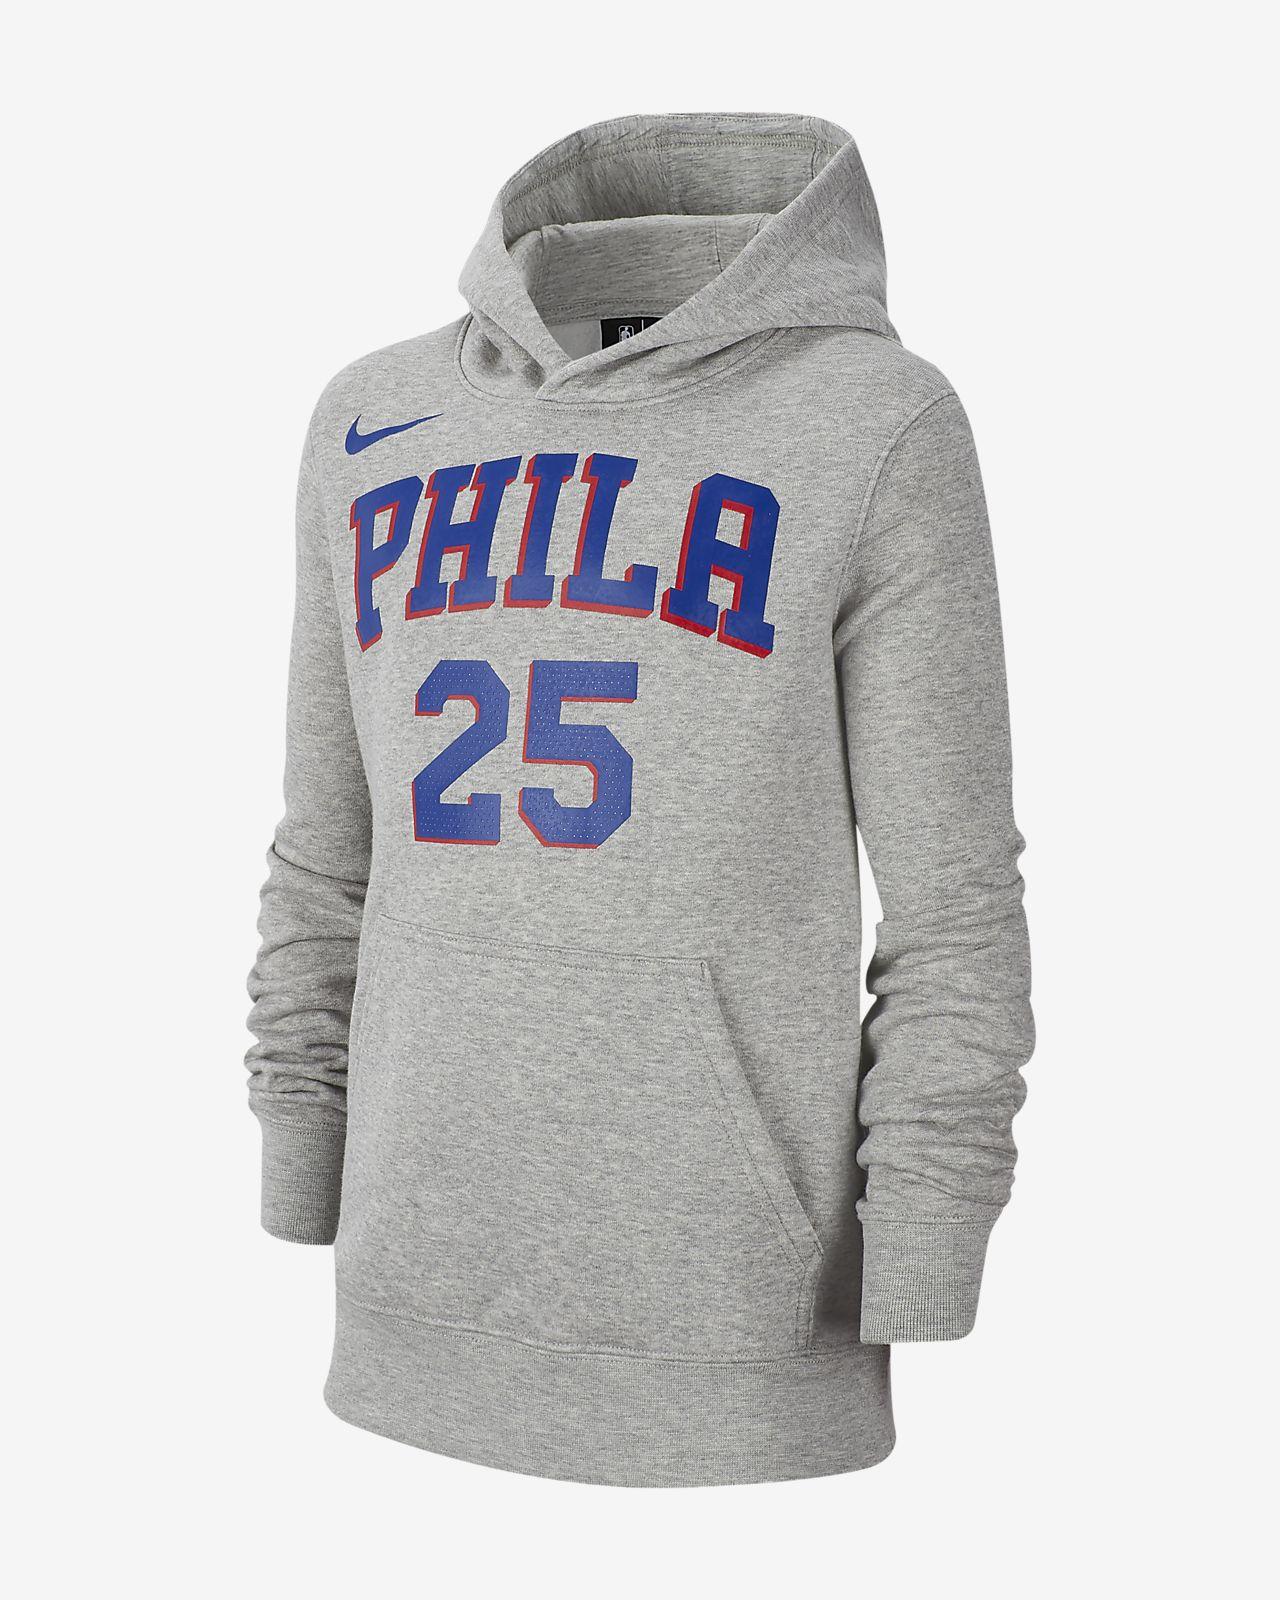 Ben Simmons Philadelphia 76ers Nike Big Kids' NBA Pullover Hoodie